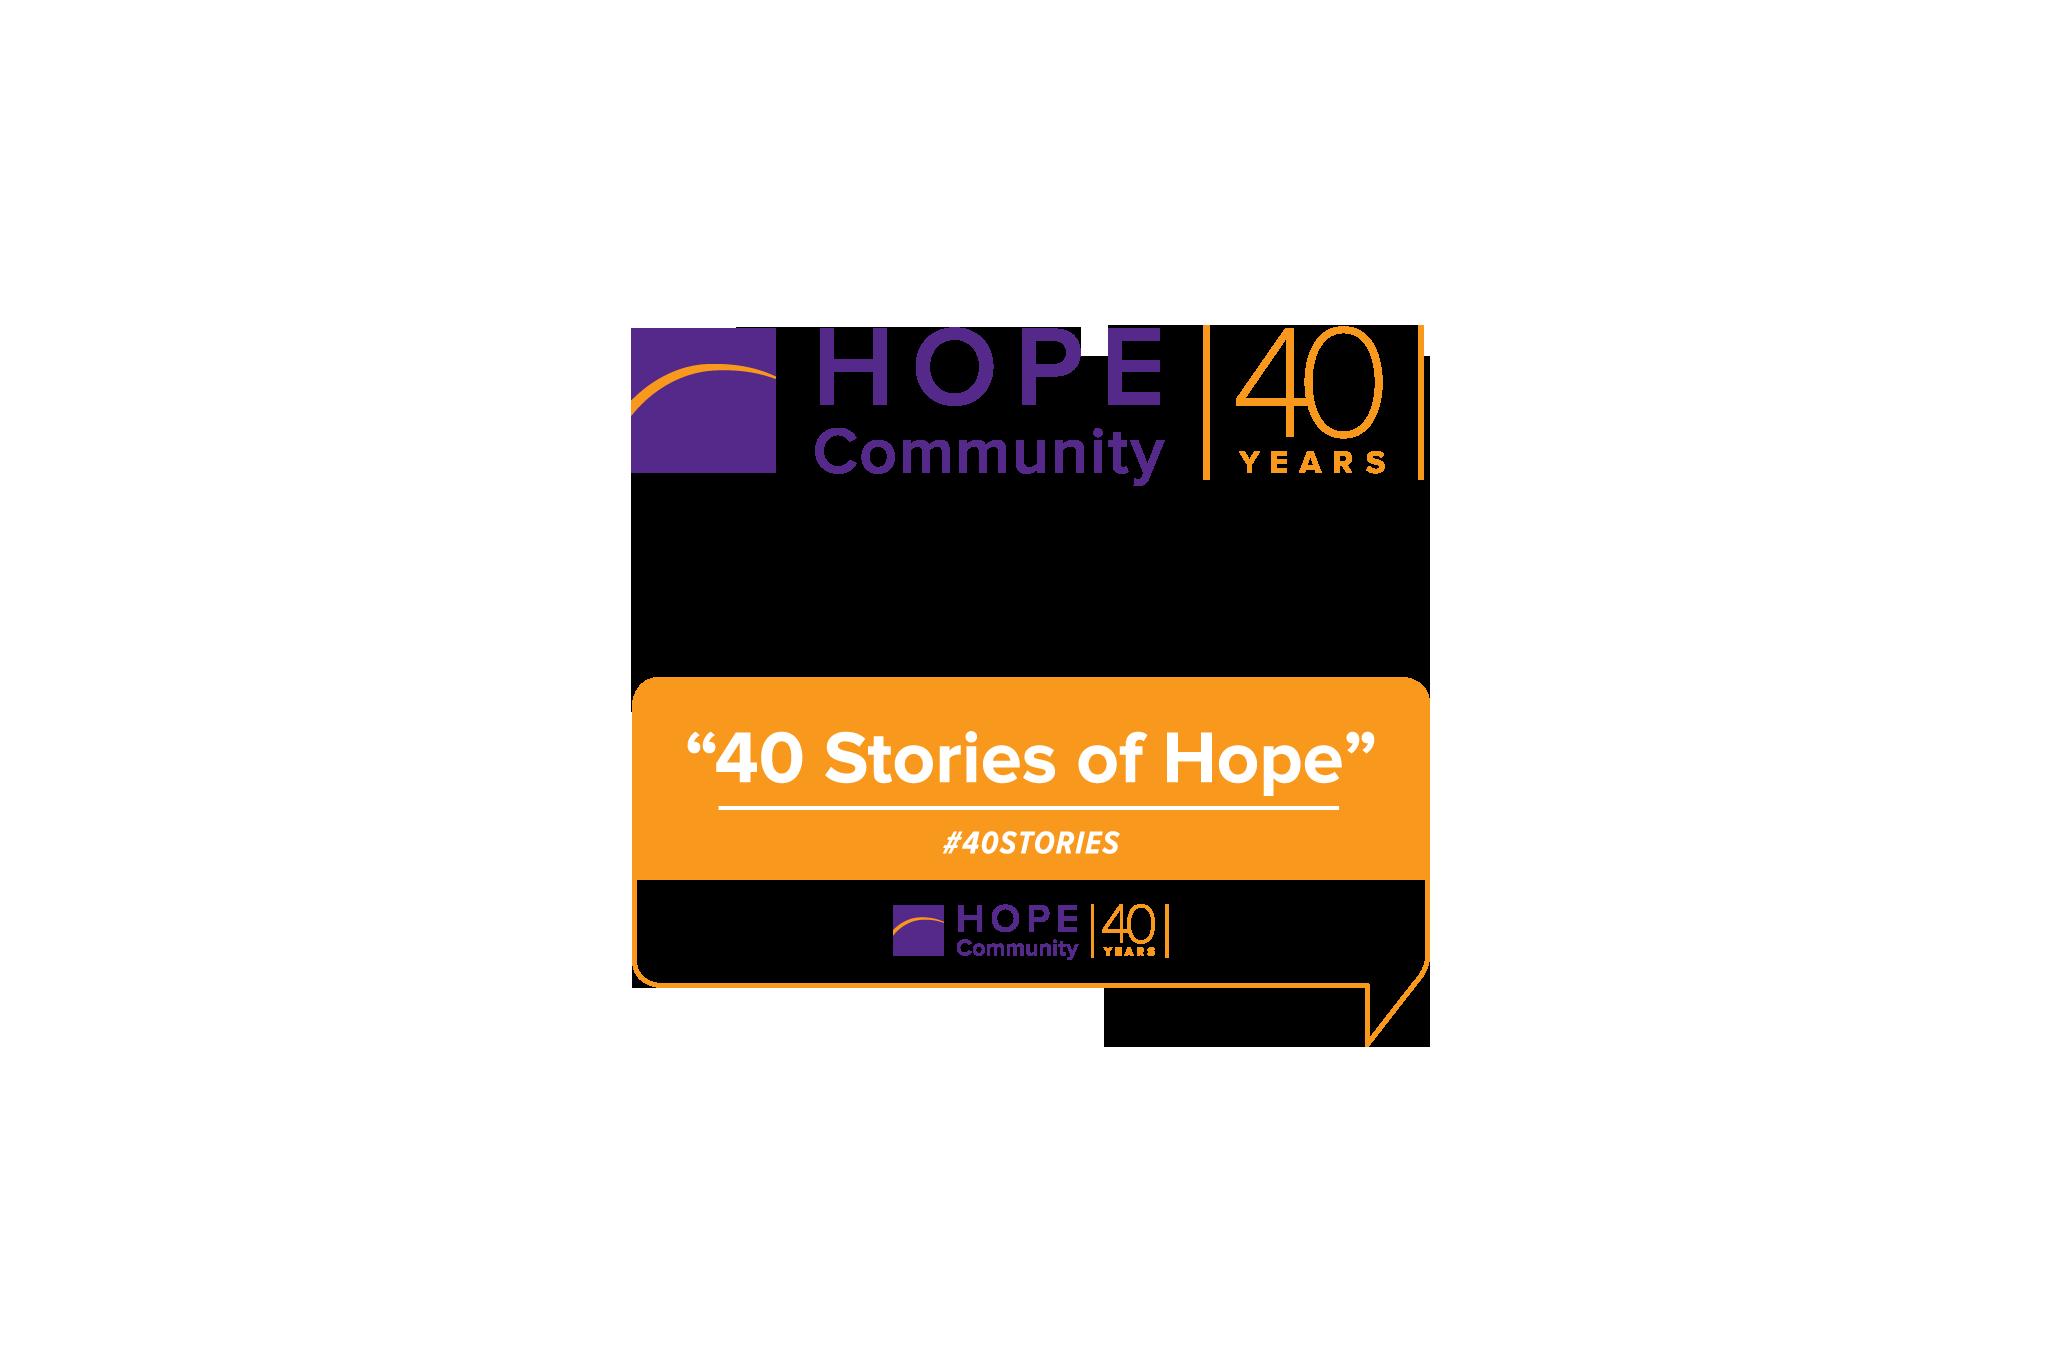 Hope Community social media graphics